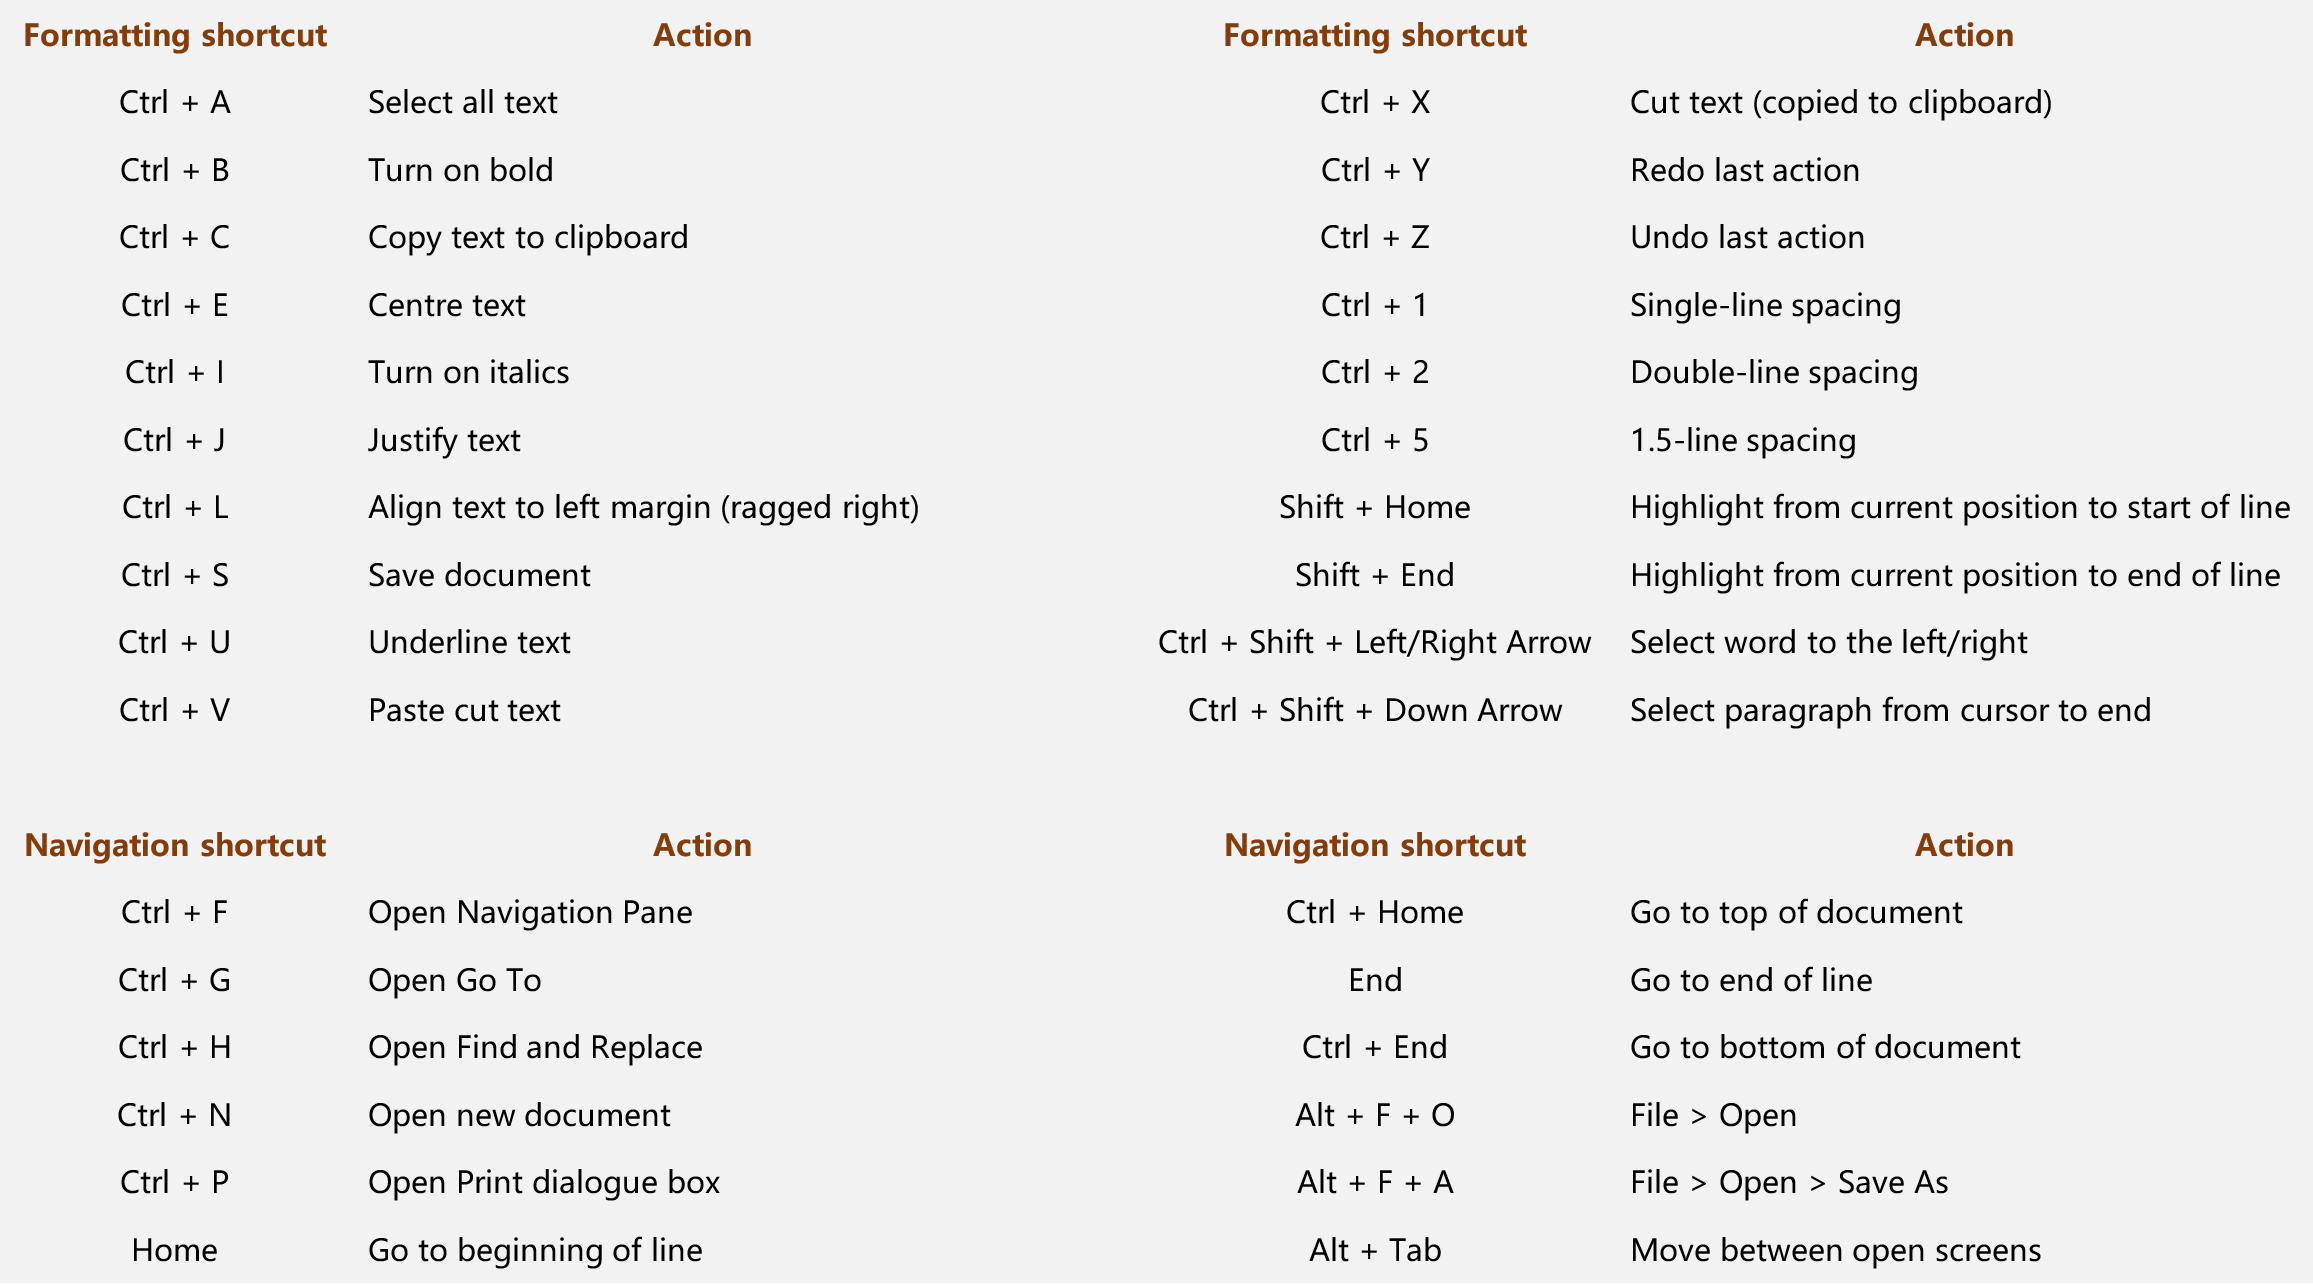 List of popular shortcuts for formatting